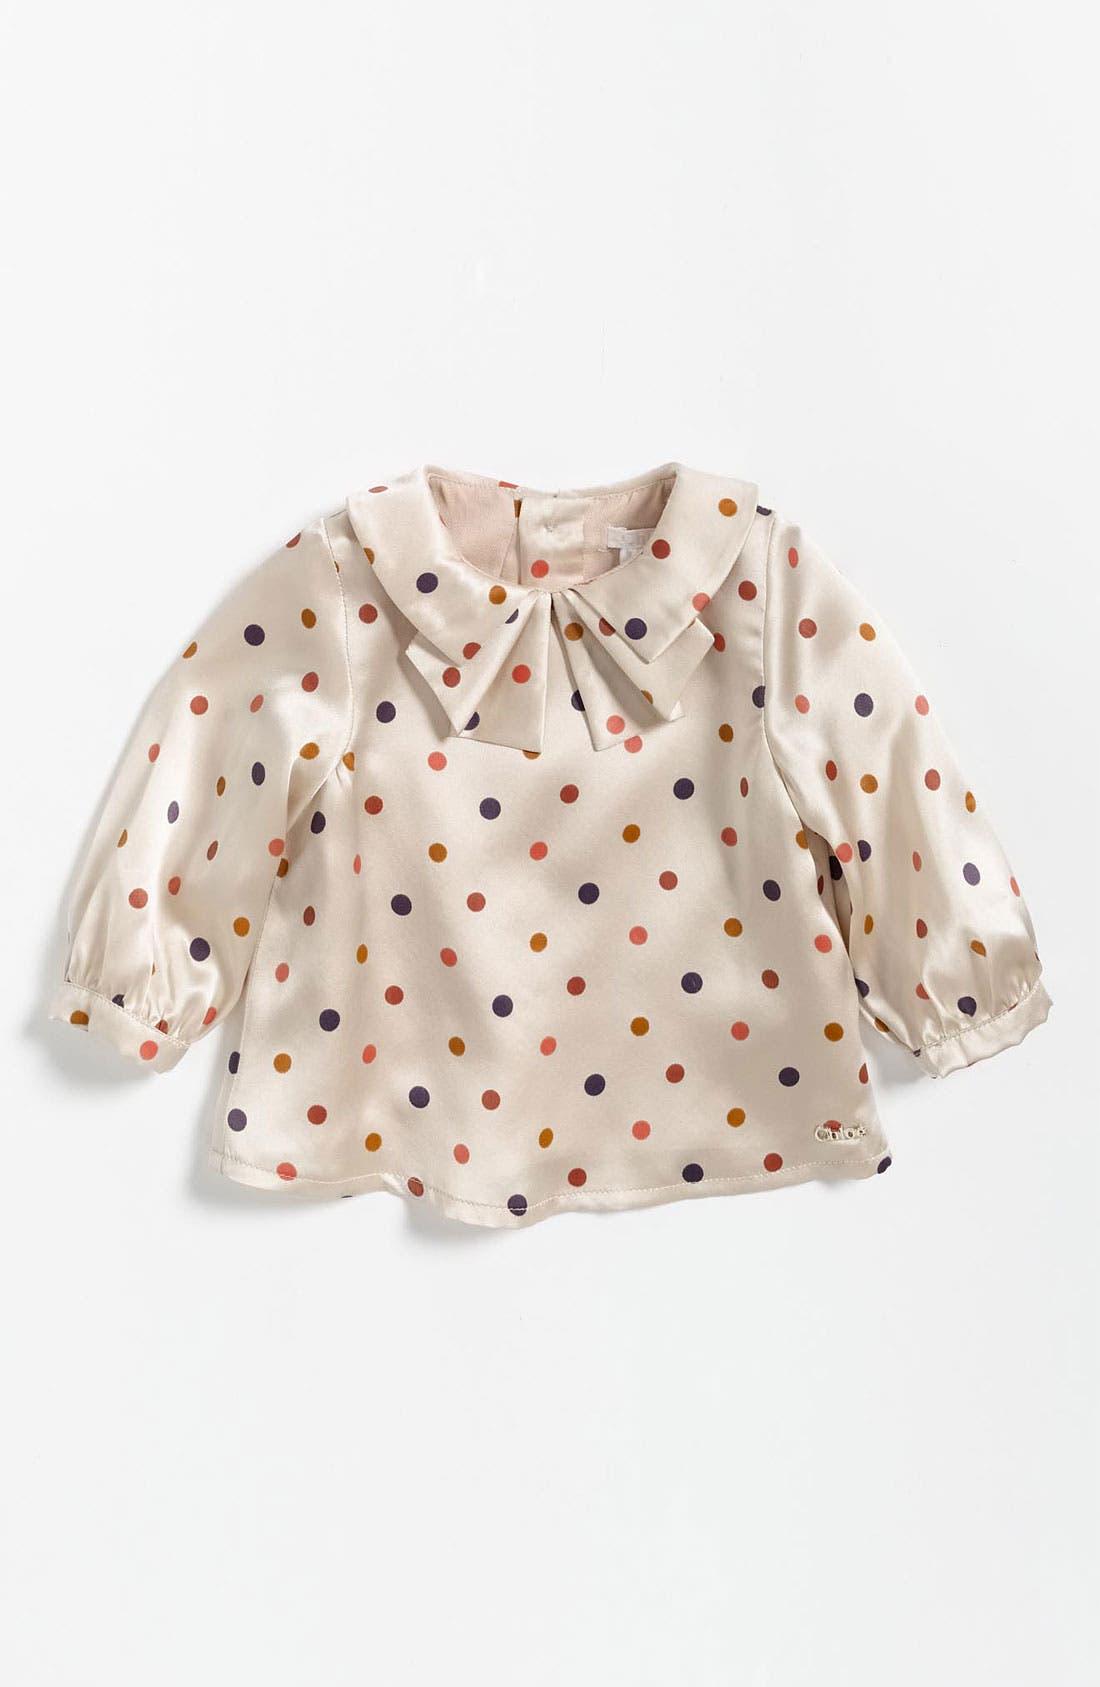 Main Image - Chloé Polka Dot Blouse (Infant)